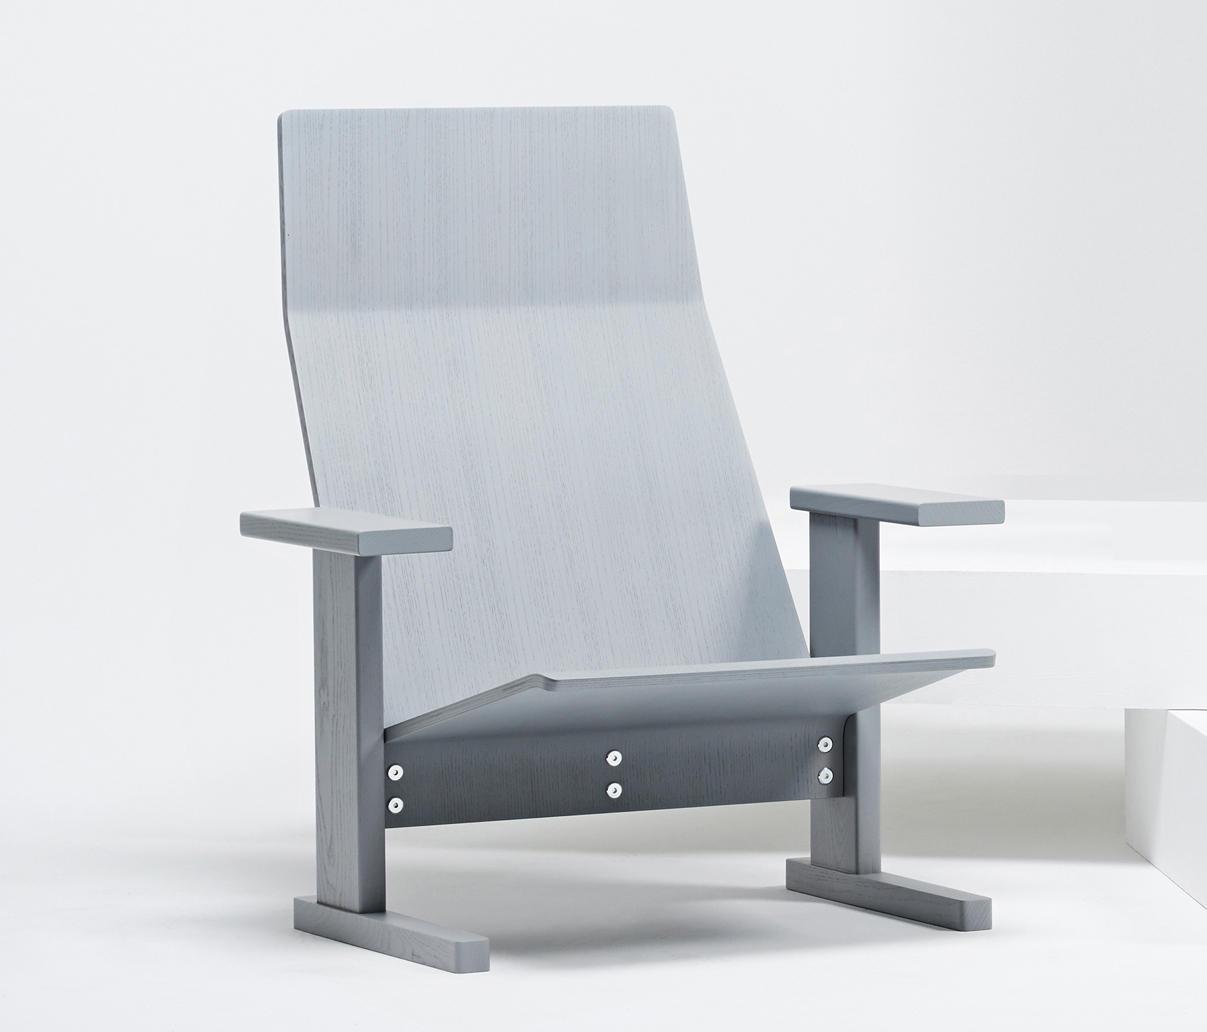 Quindici Lounge Chair by Mattiazzi